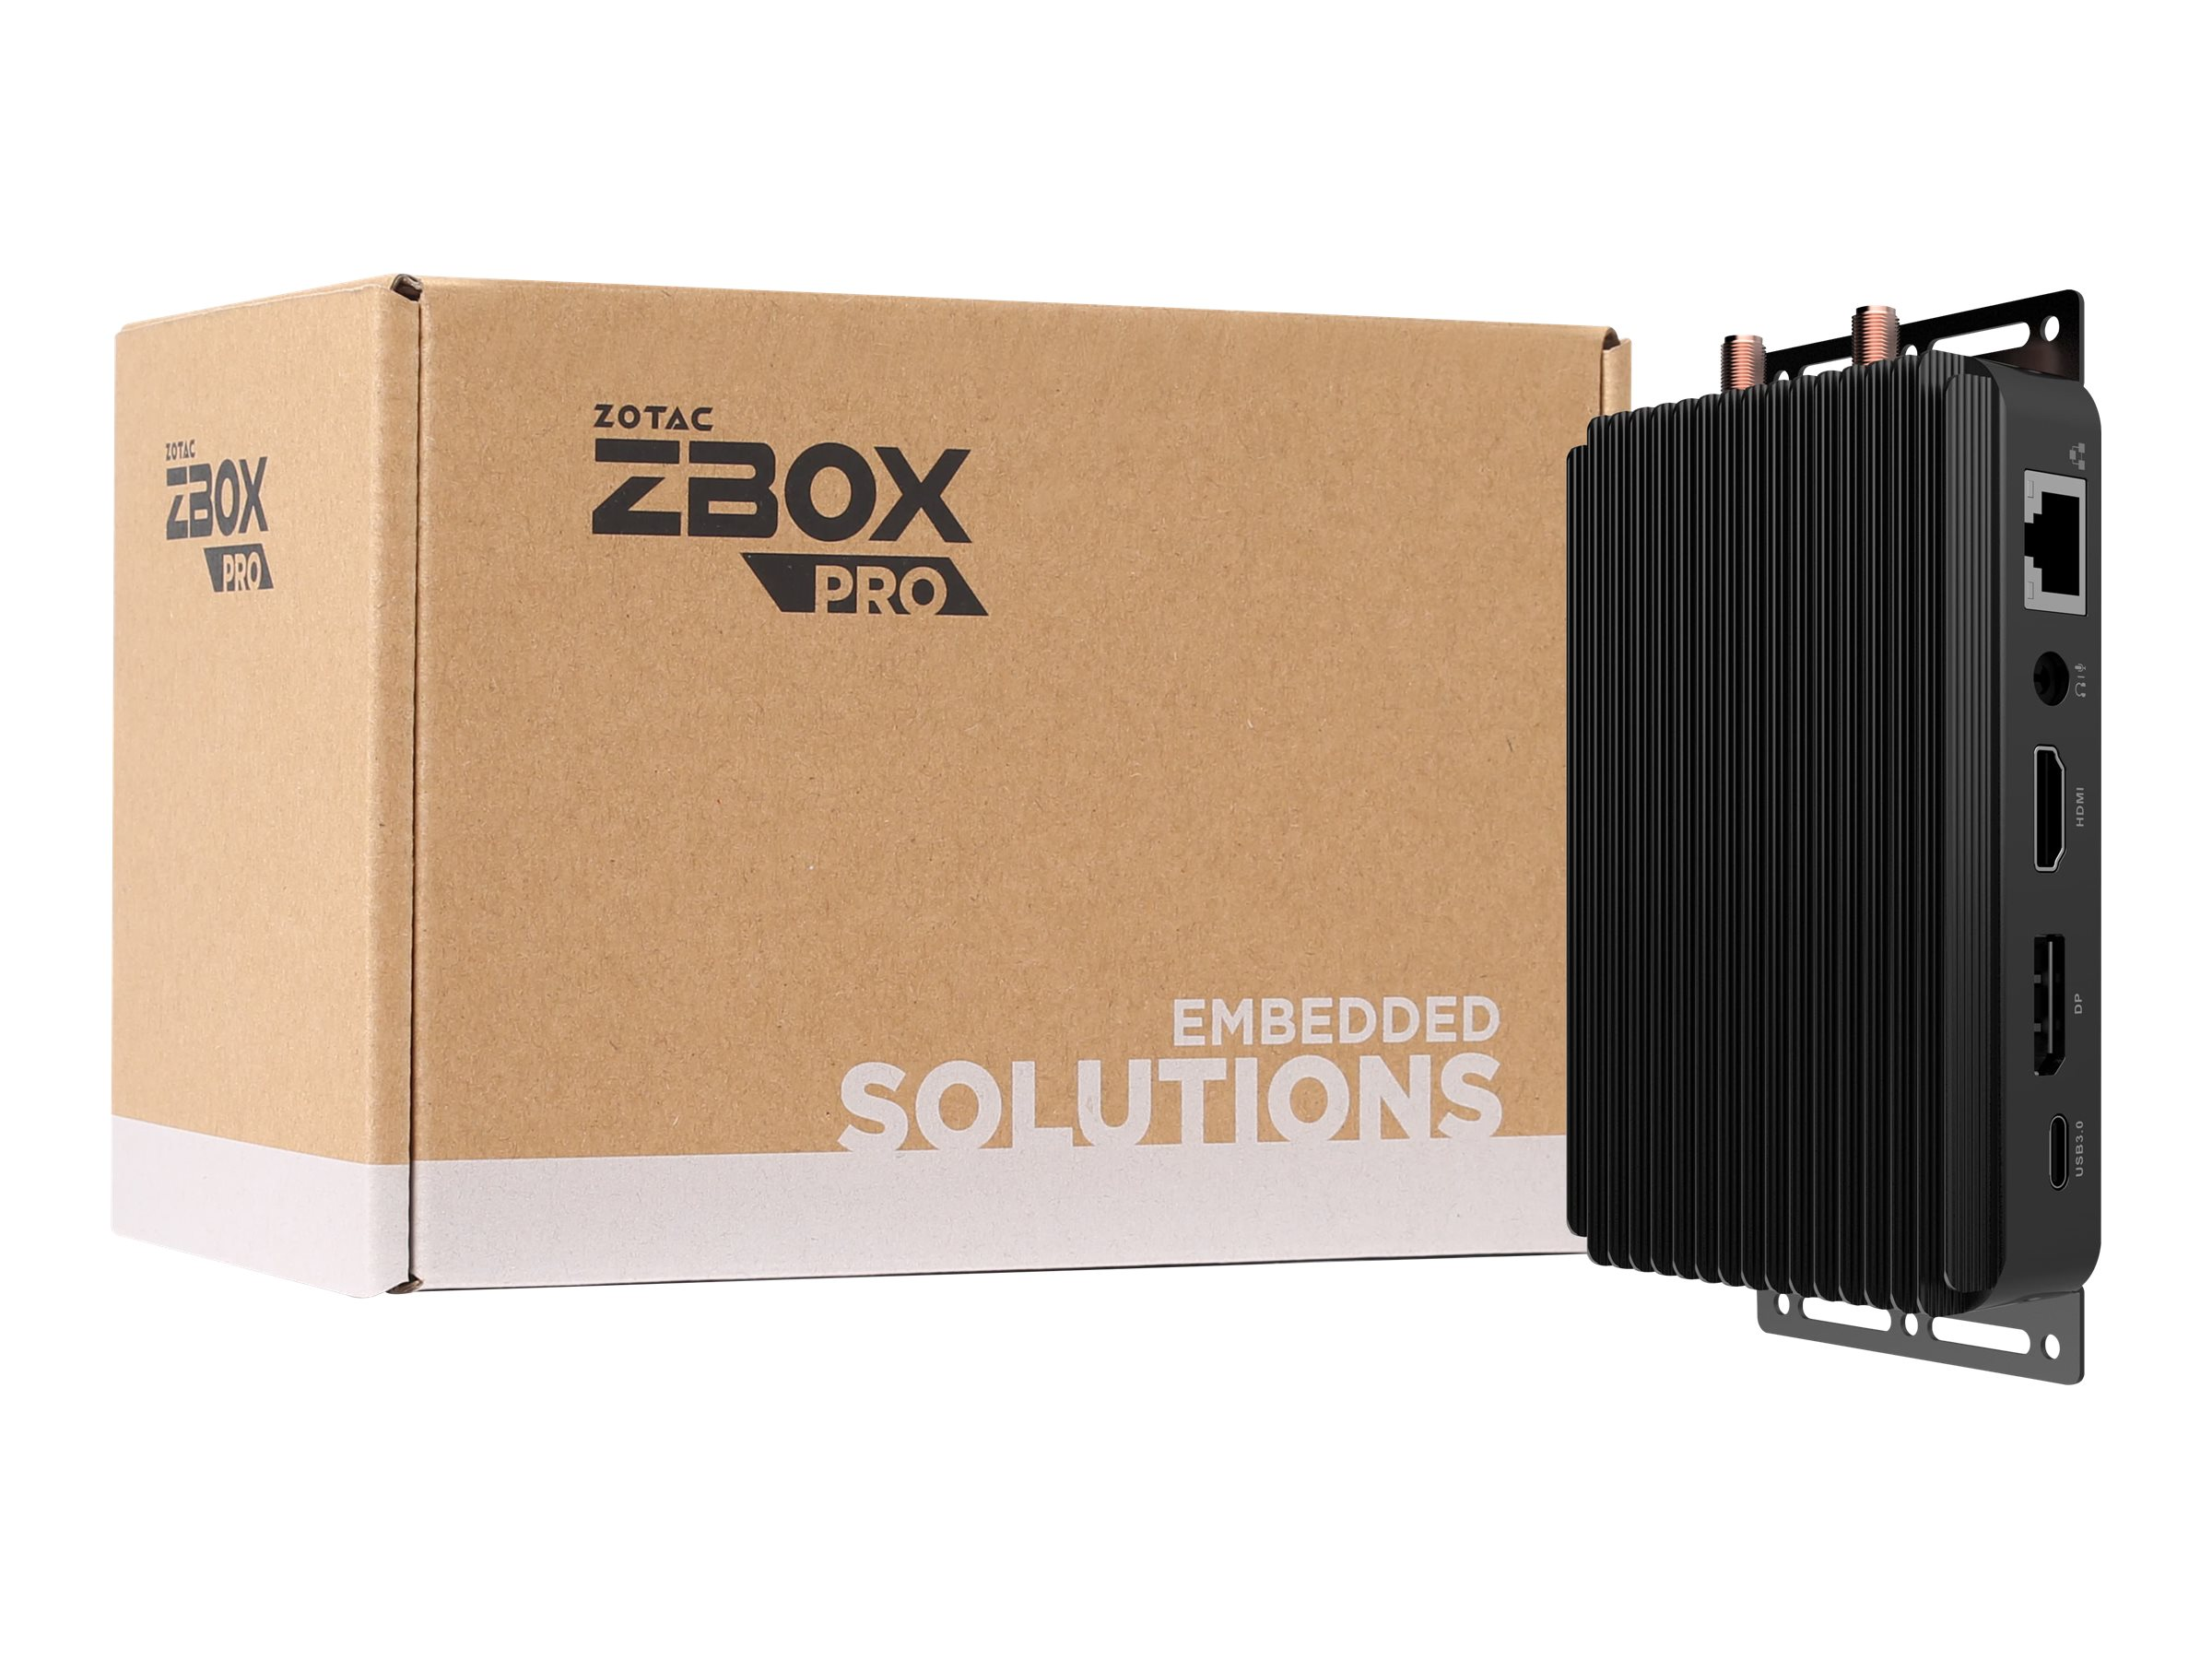 ZOTAC ZBOX PRO PI335 pico - Mini-PC - 1 x Celeron N4100 / 1.1 GHz - RAM 4 GB - SSD - eMMC 64 GB